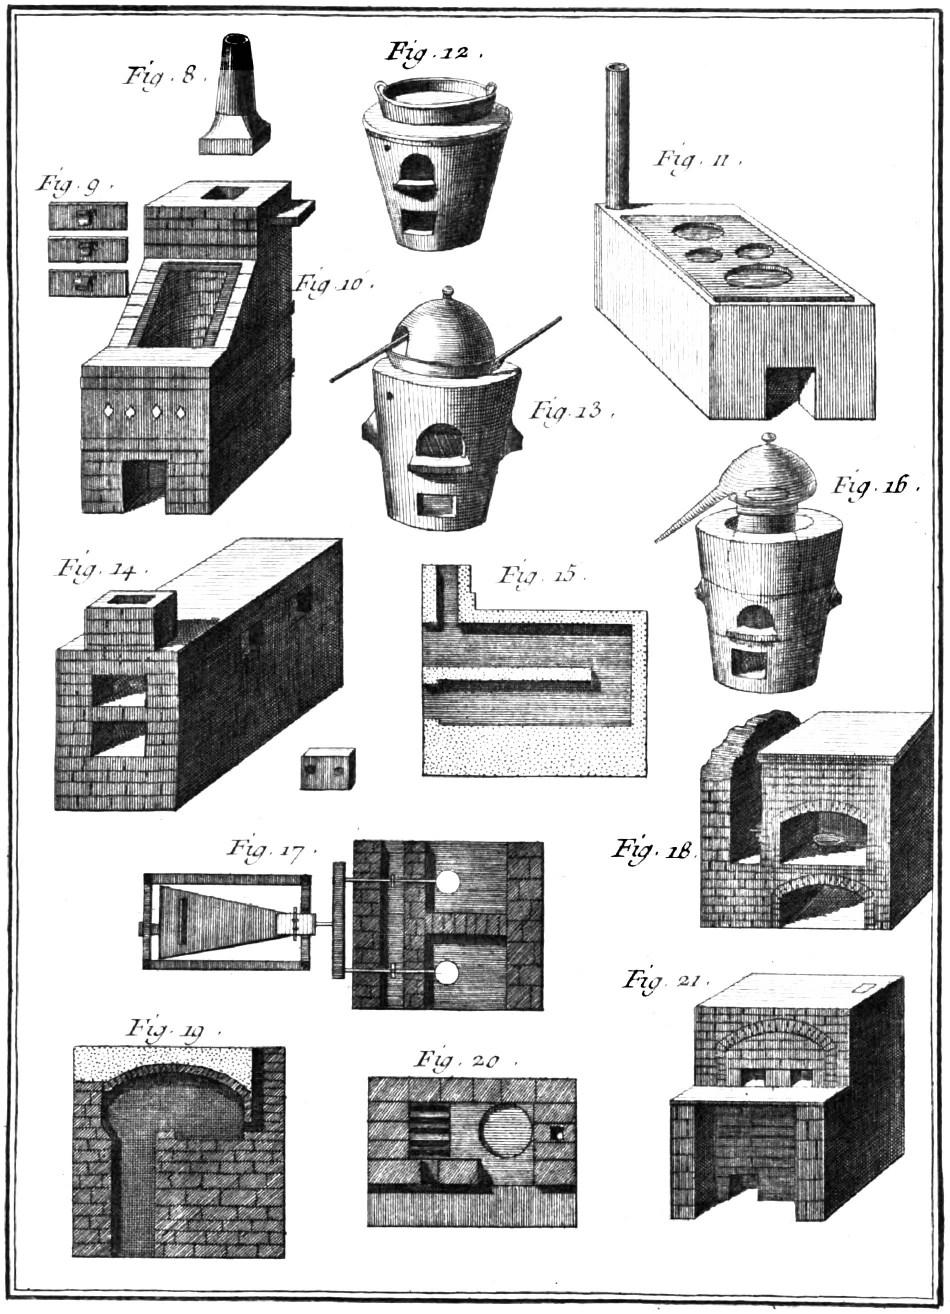 diderot and dalembert alchemical symbols